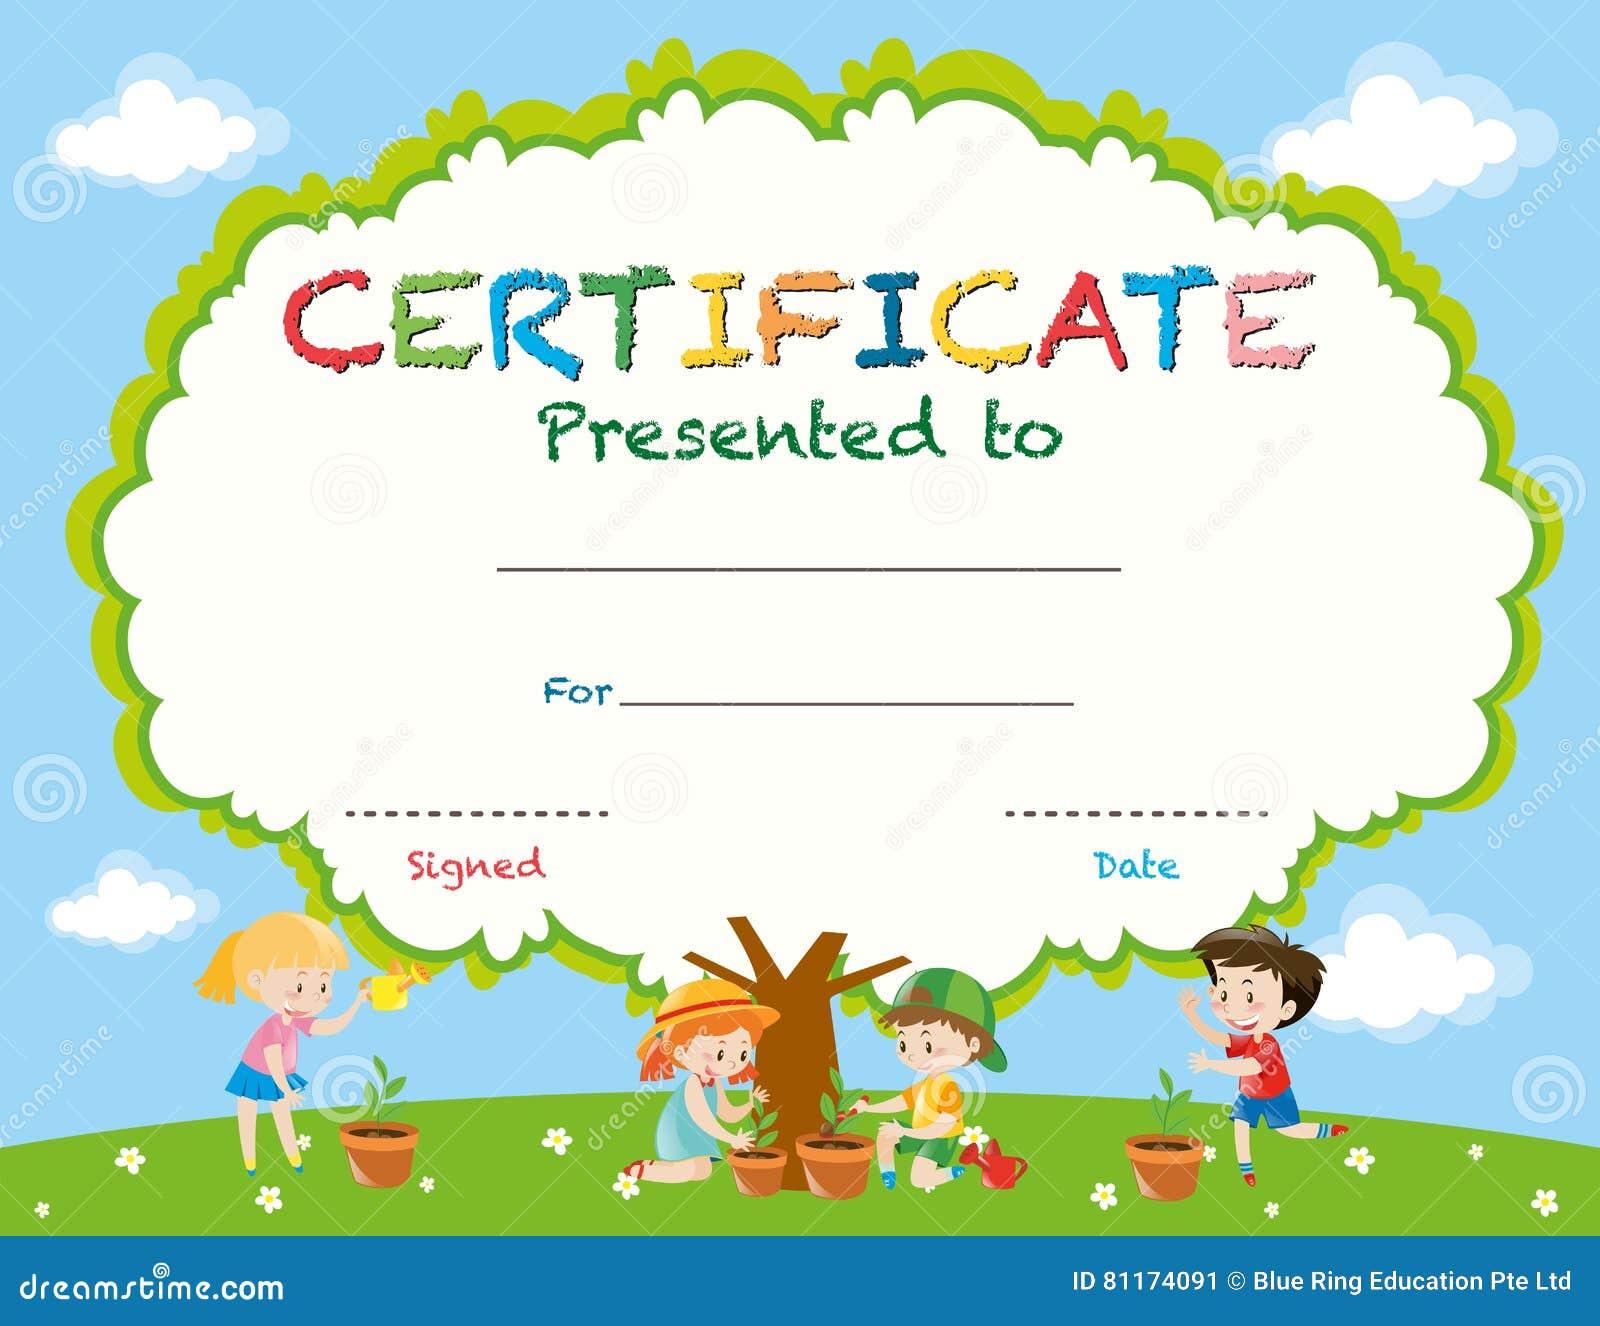 Kids certificate template datariouruguay preschool graduation certificate template free yelopaper Choice Image